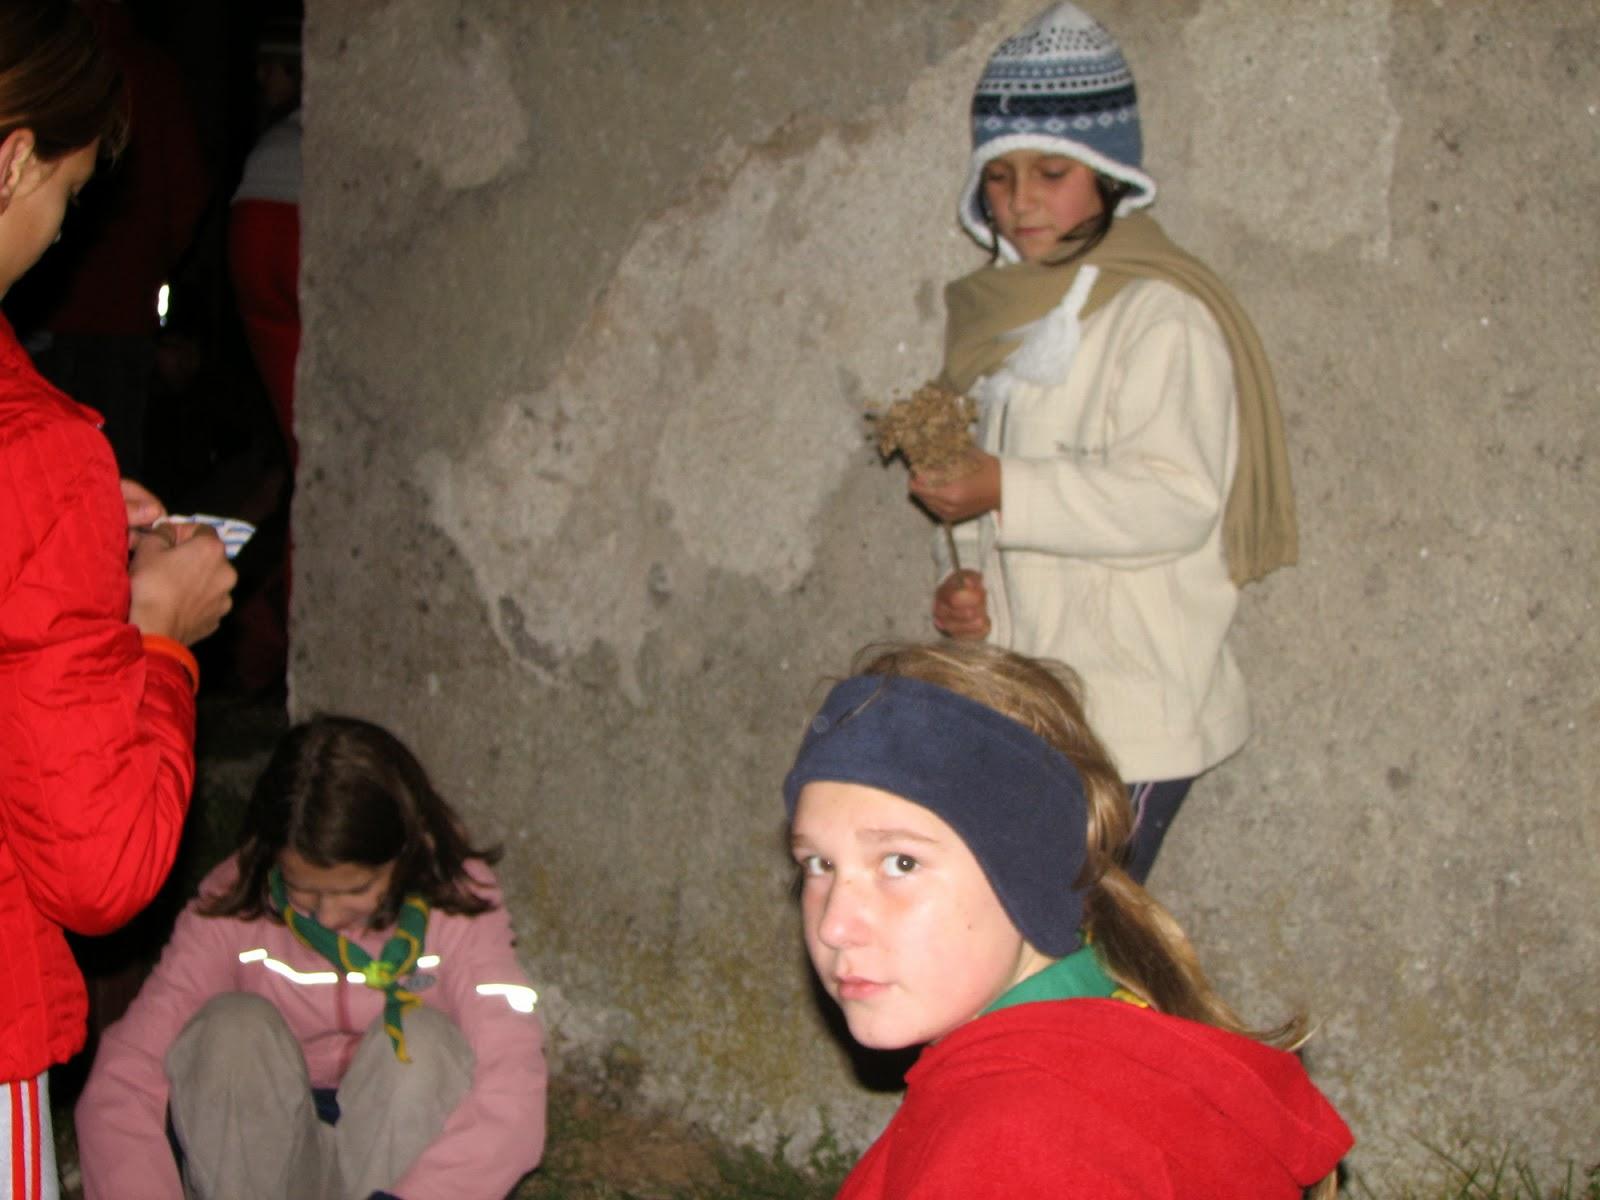 Vodov izlet, Ilirska Bistrica 2005 - Picture%2B045.jpg